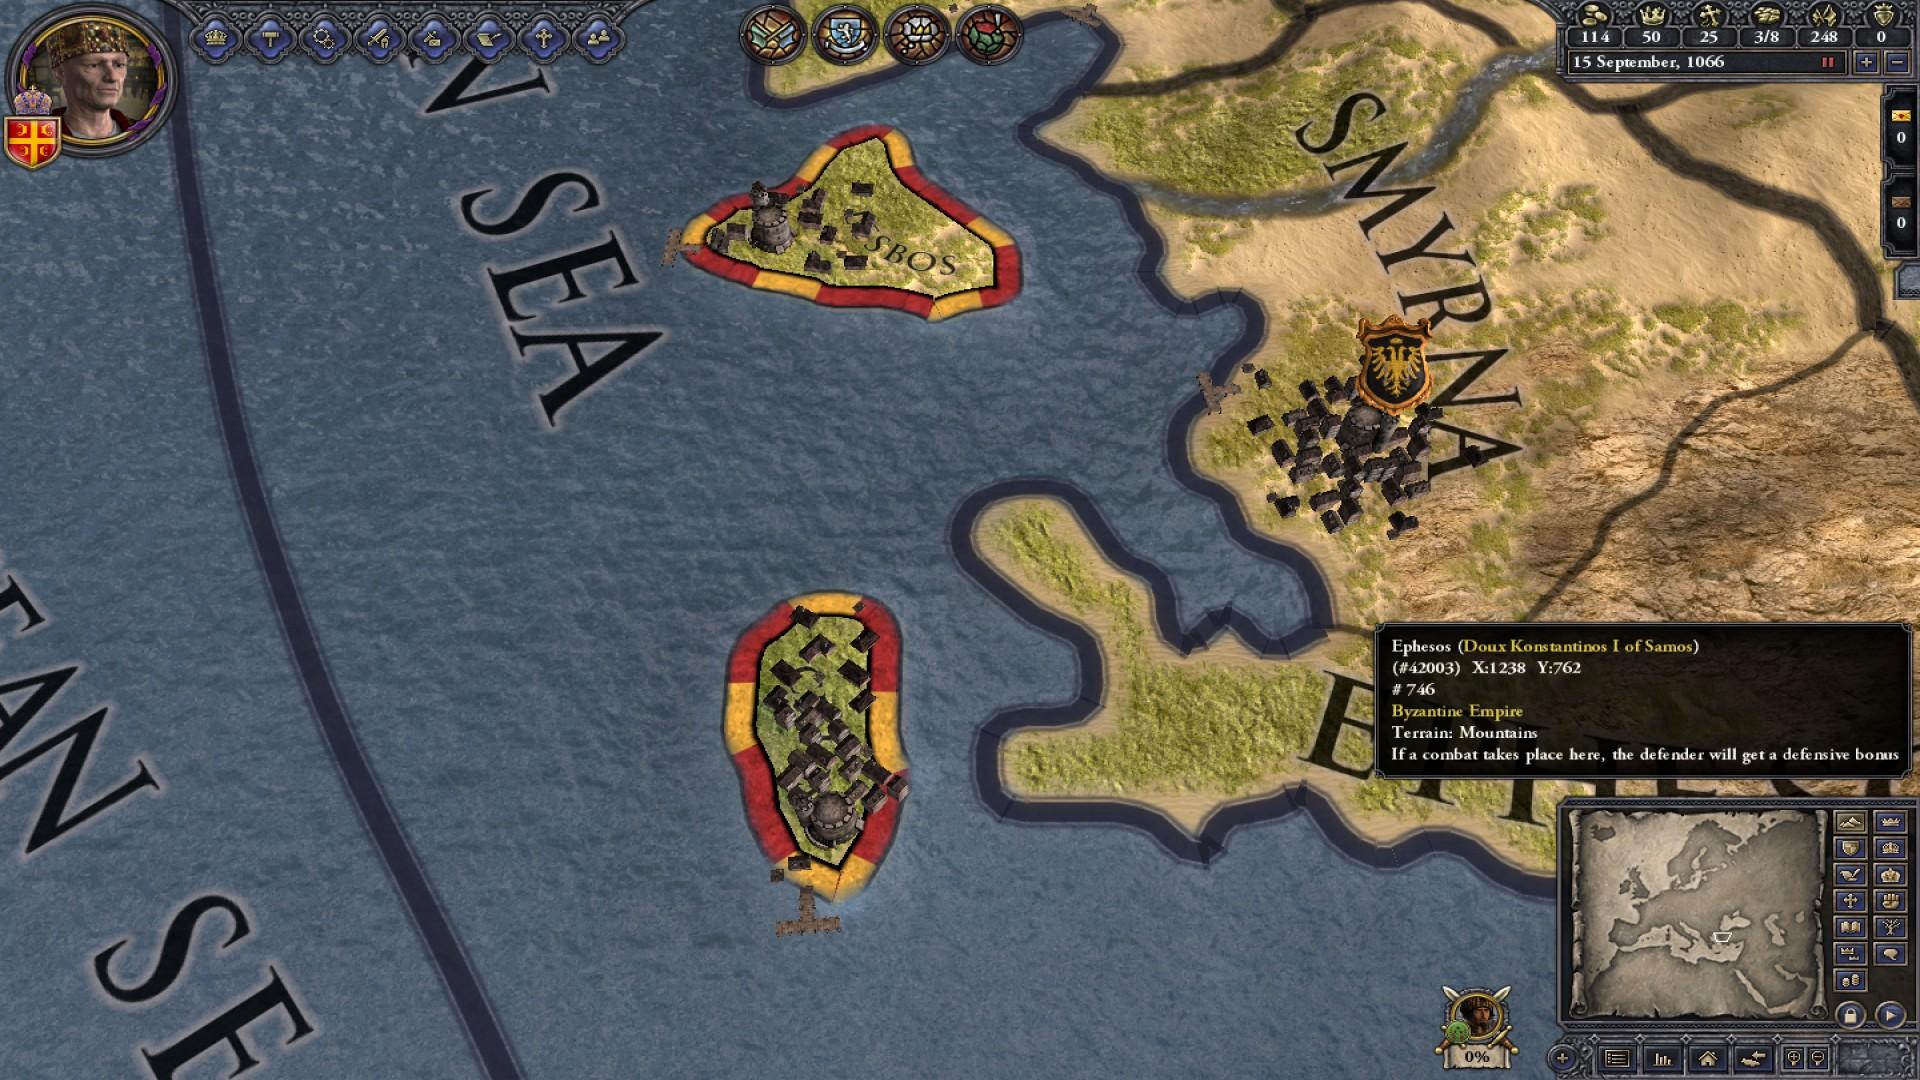 Crusader Kings II: Songs of Byzantium screenshot